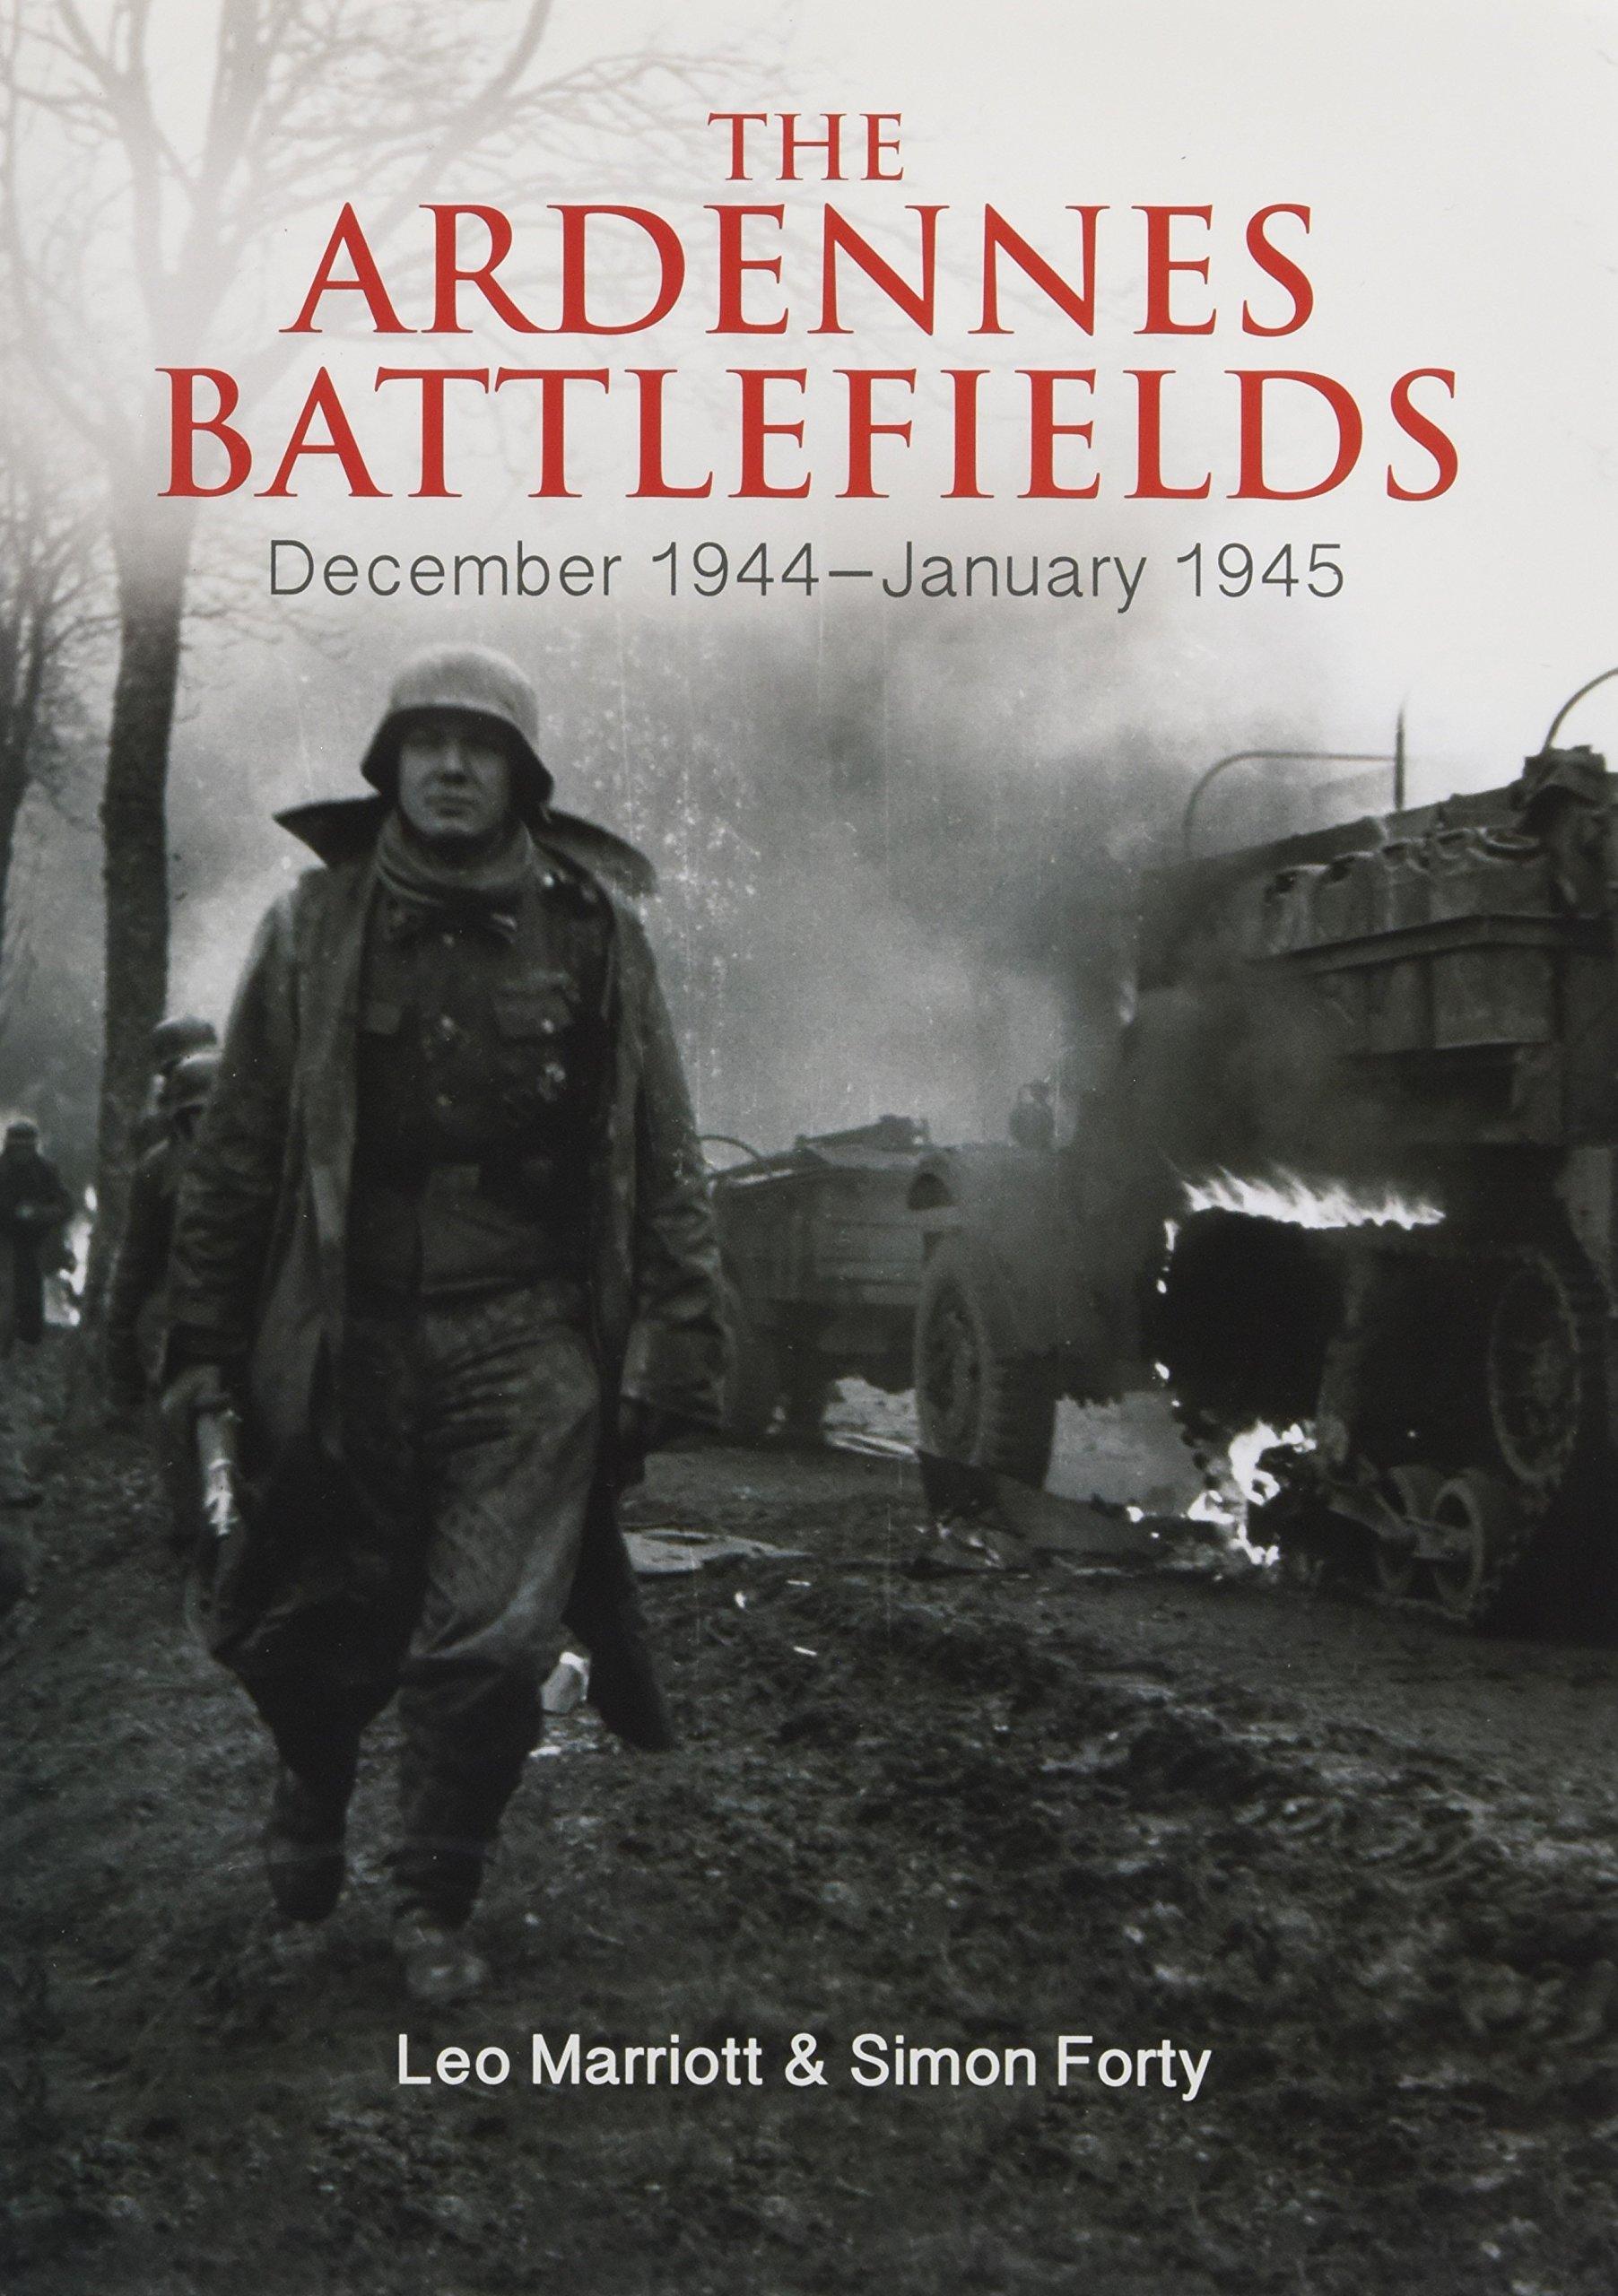 The Ardennes Battlefields: December 1944–January 1945